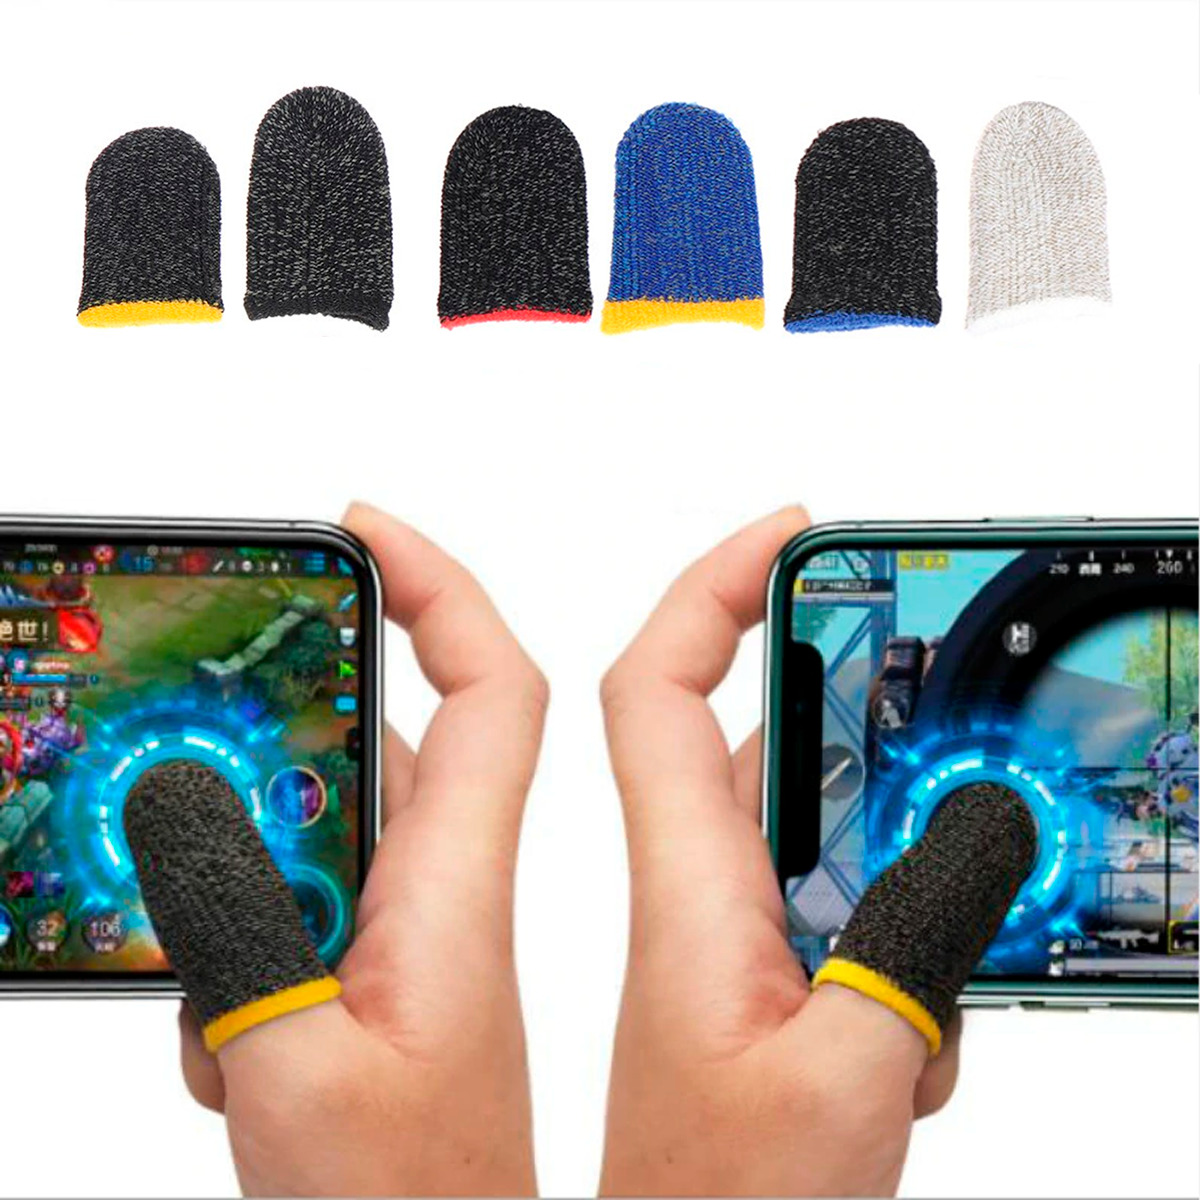 Fundas Gamer Touch Dedos Guante Anti- Sudor Sensibilidad